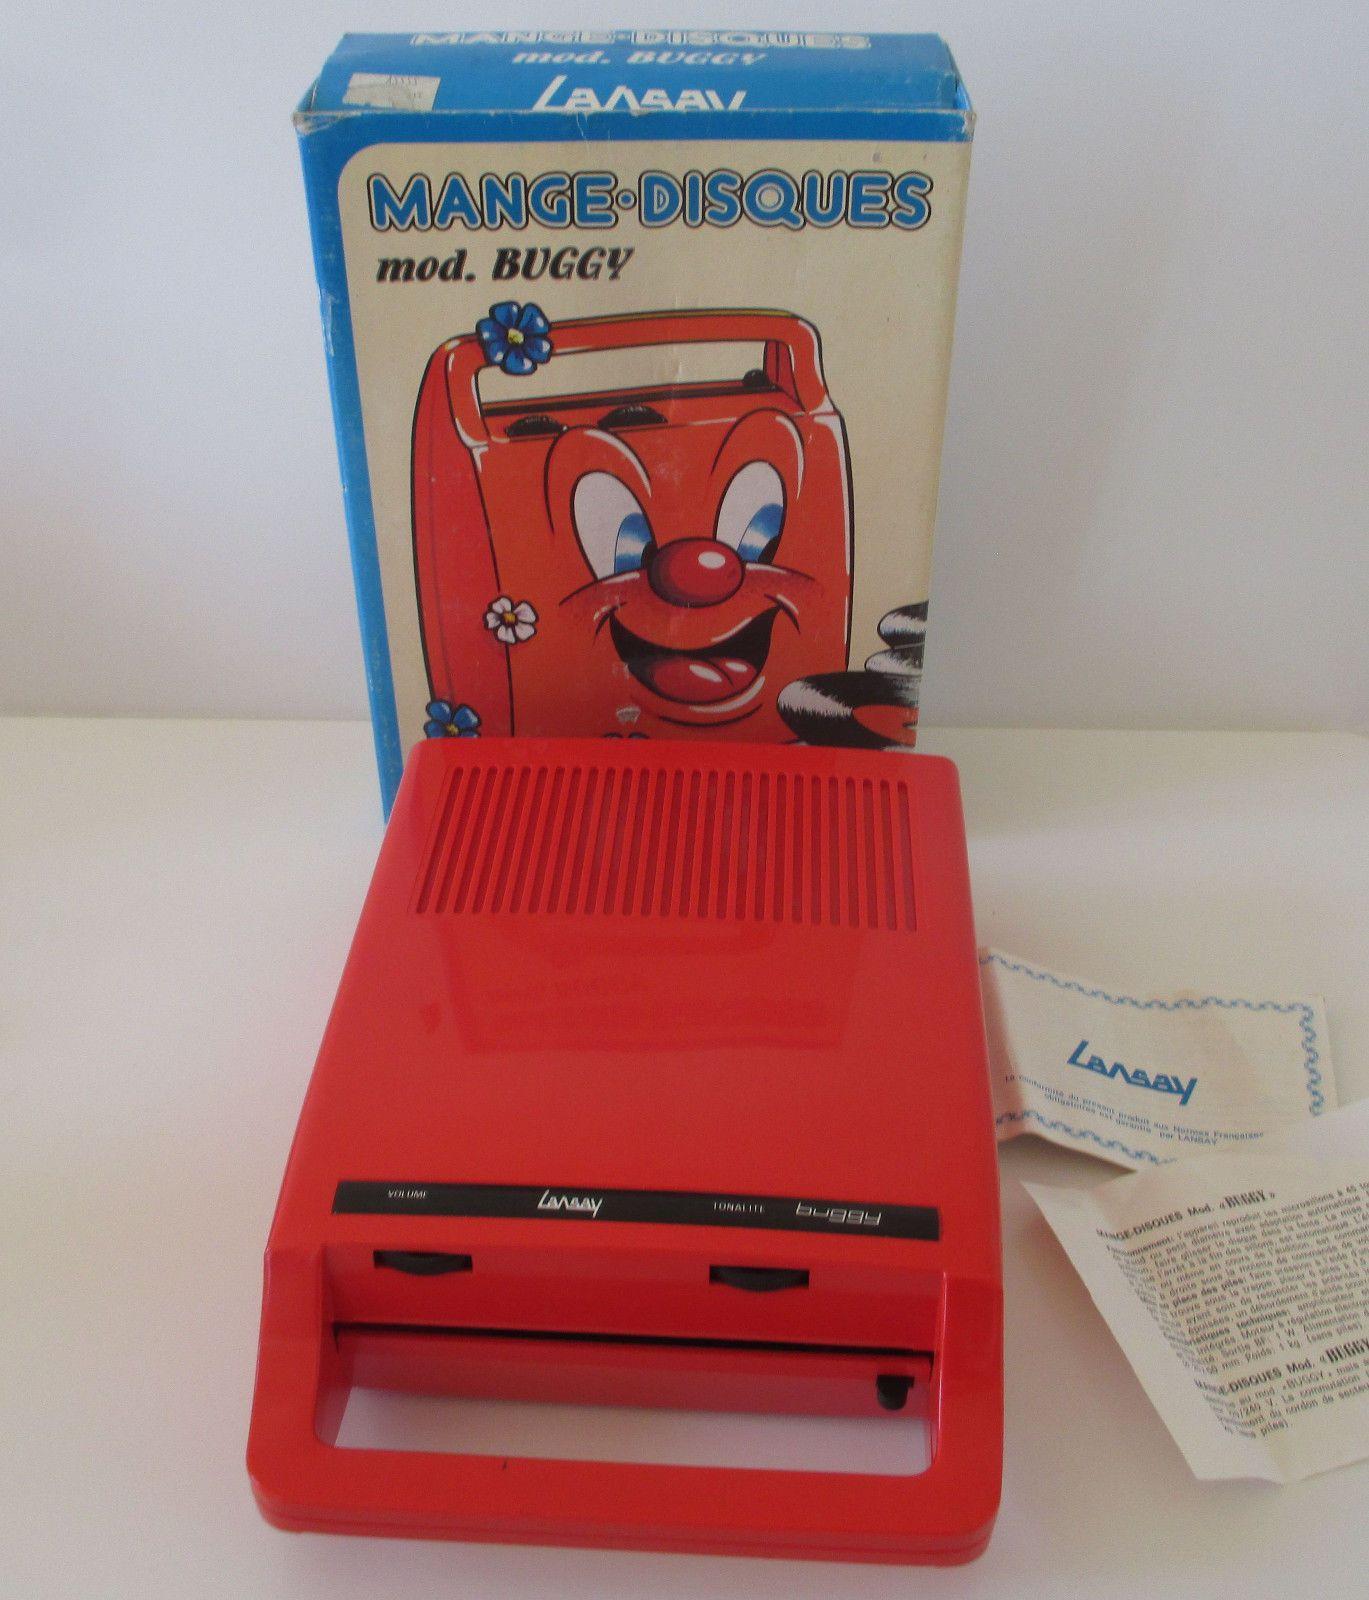 lansay buggy mange disque lansay buggy rouge dans sa boite d 39 origine vinyle 45 tours image. Black Bedroom Furniture Sets. Home Design Ideas